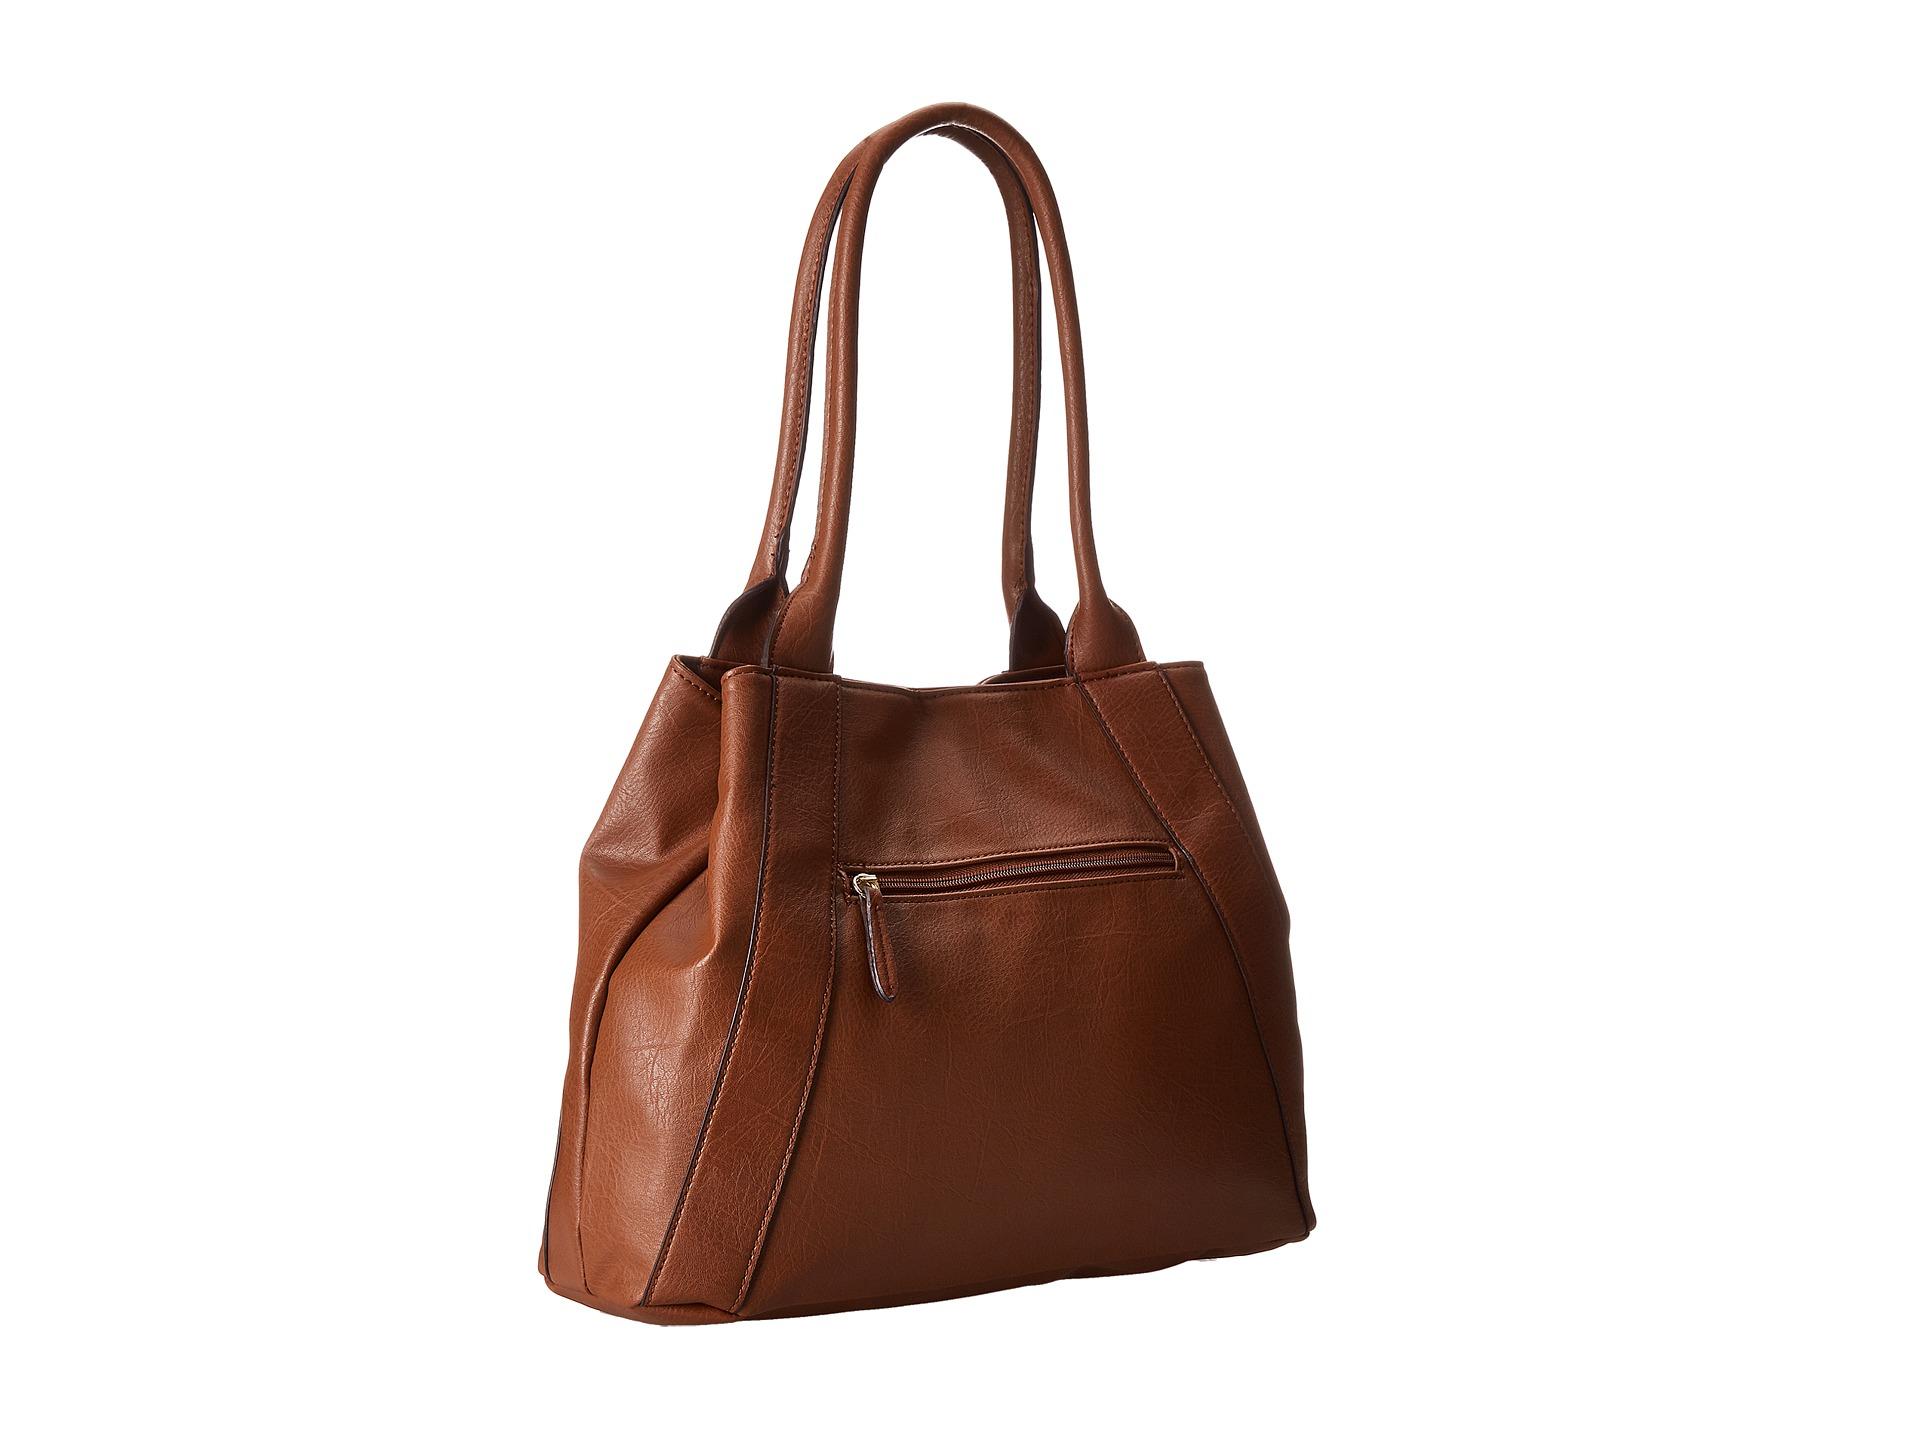 Franco Sarto Brown Leather Purse Best Image Ccdbb